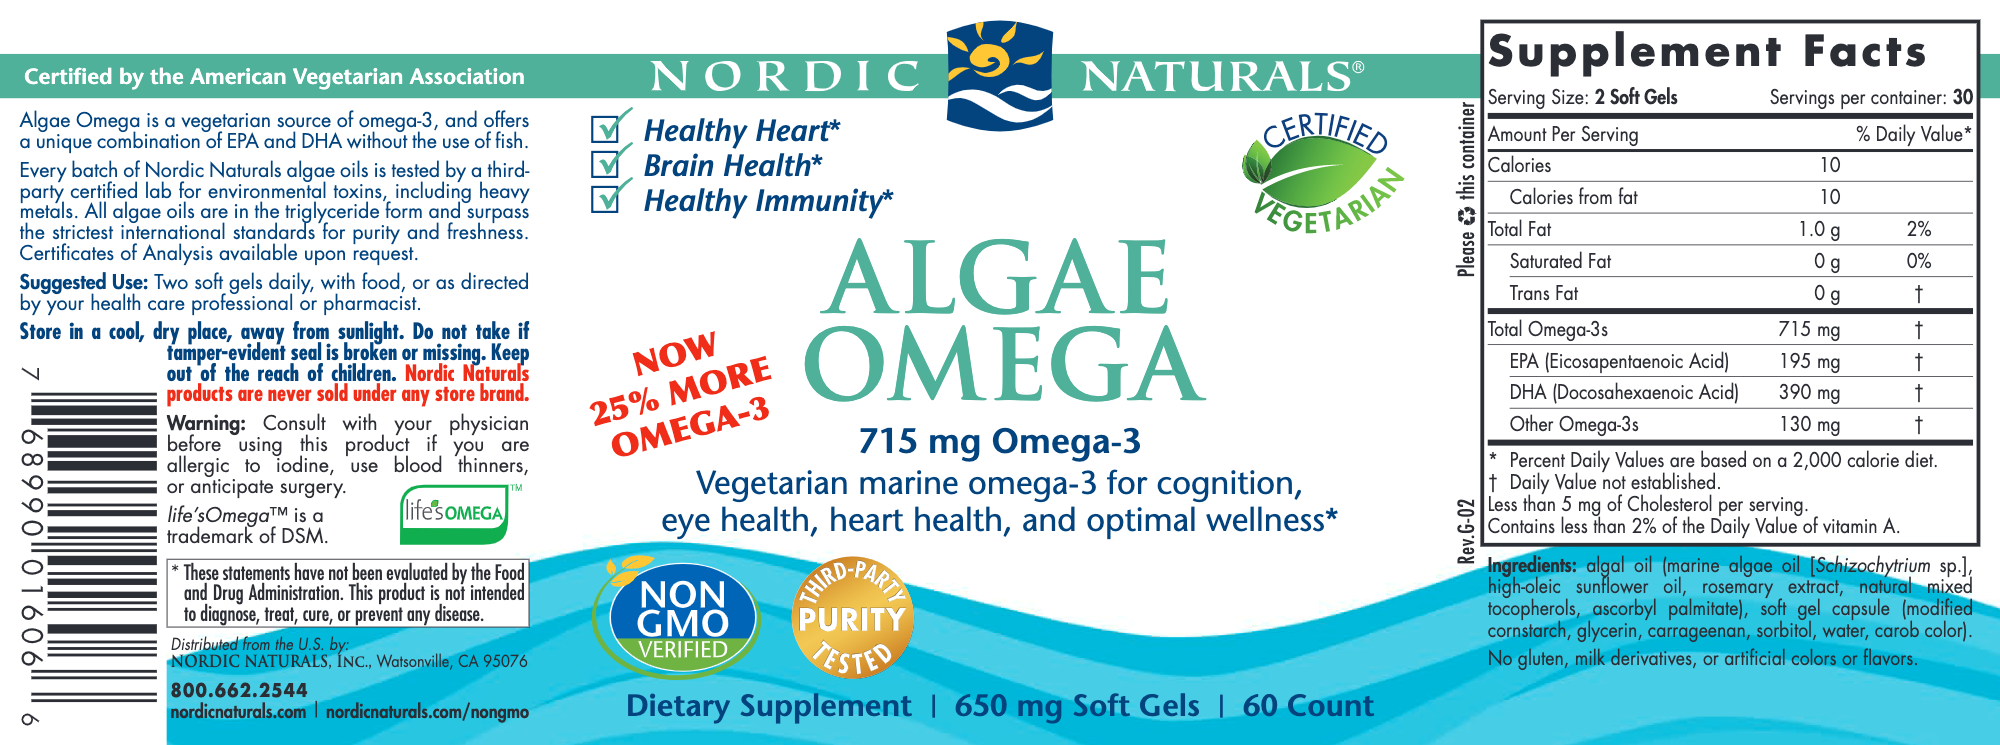 Algae Omega (Vegan)